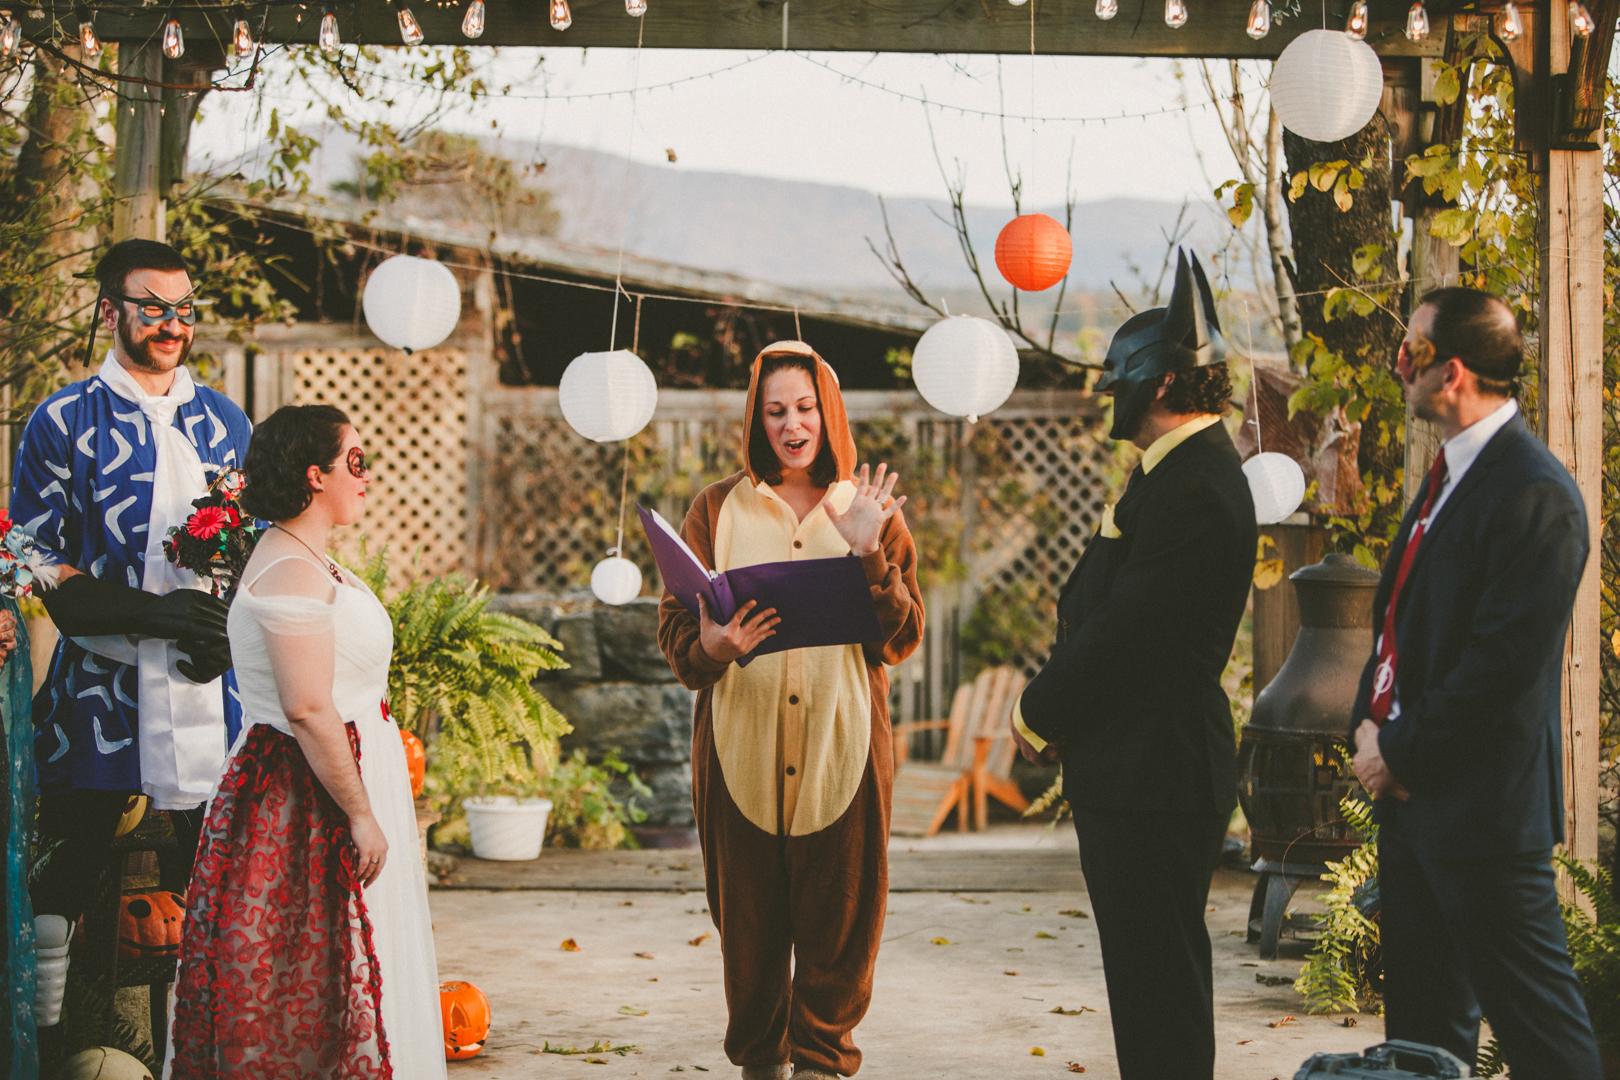 Mike&Hannah_HalloweenWedding-19.jpg